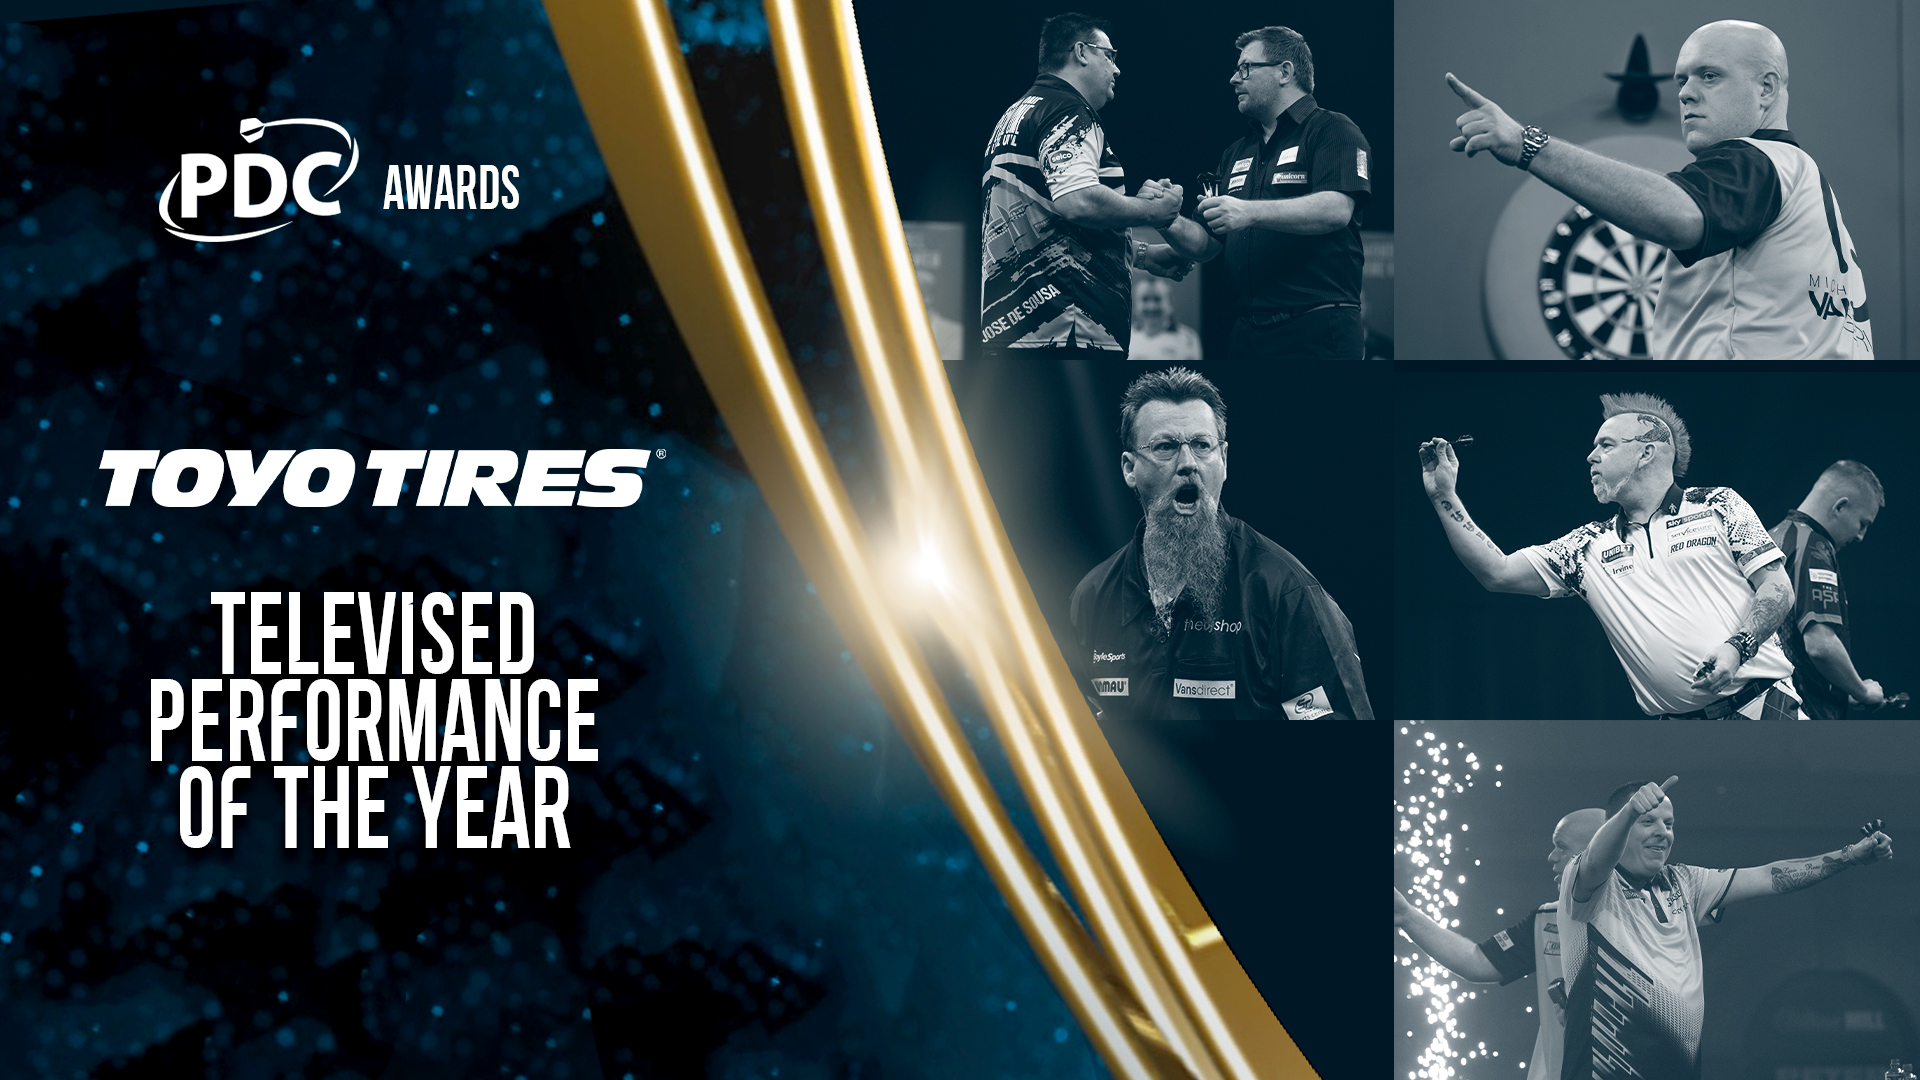 Michael van Gerwen leads list of Toyo darts award nominees